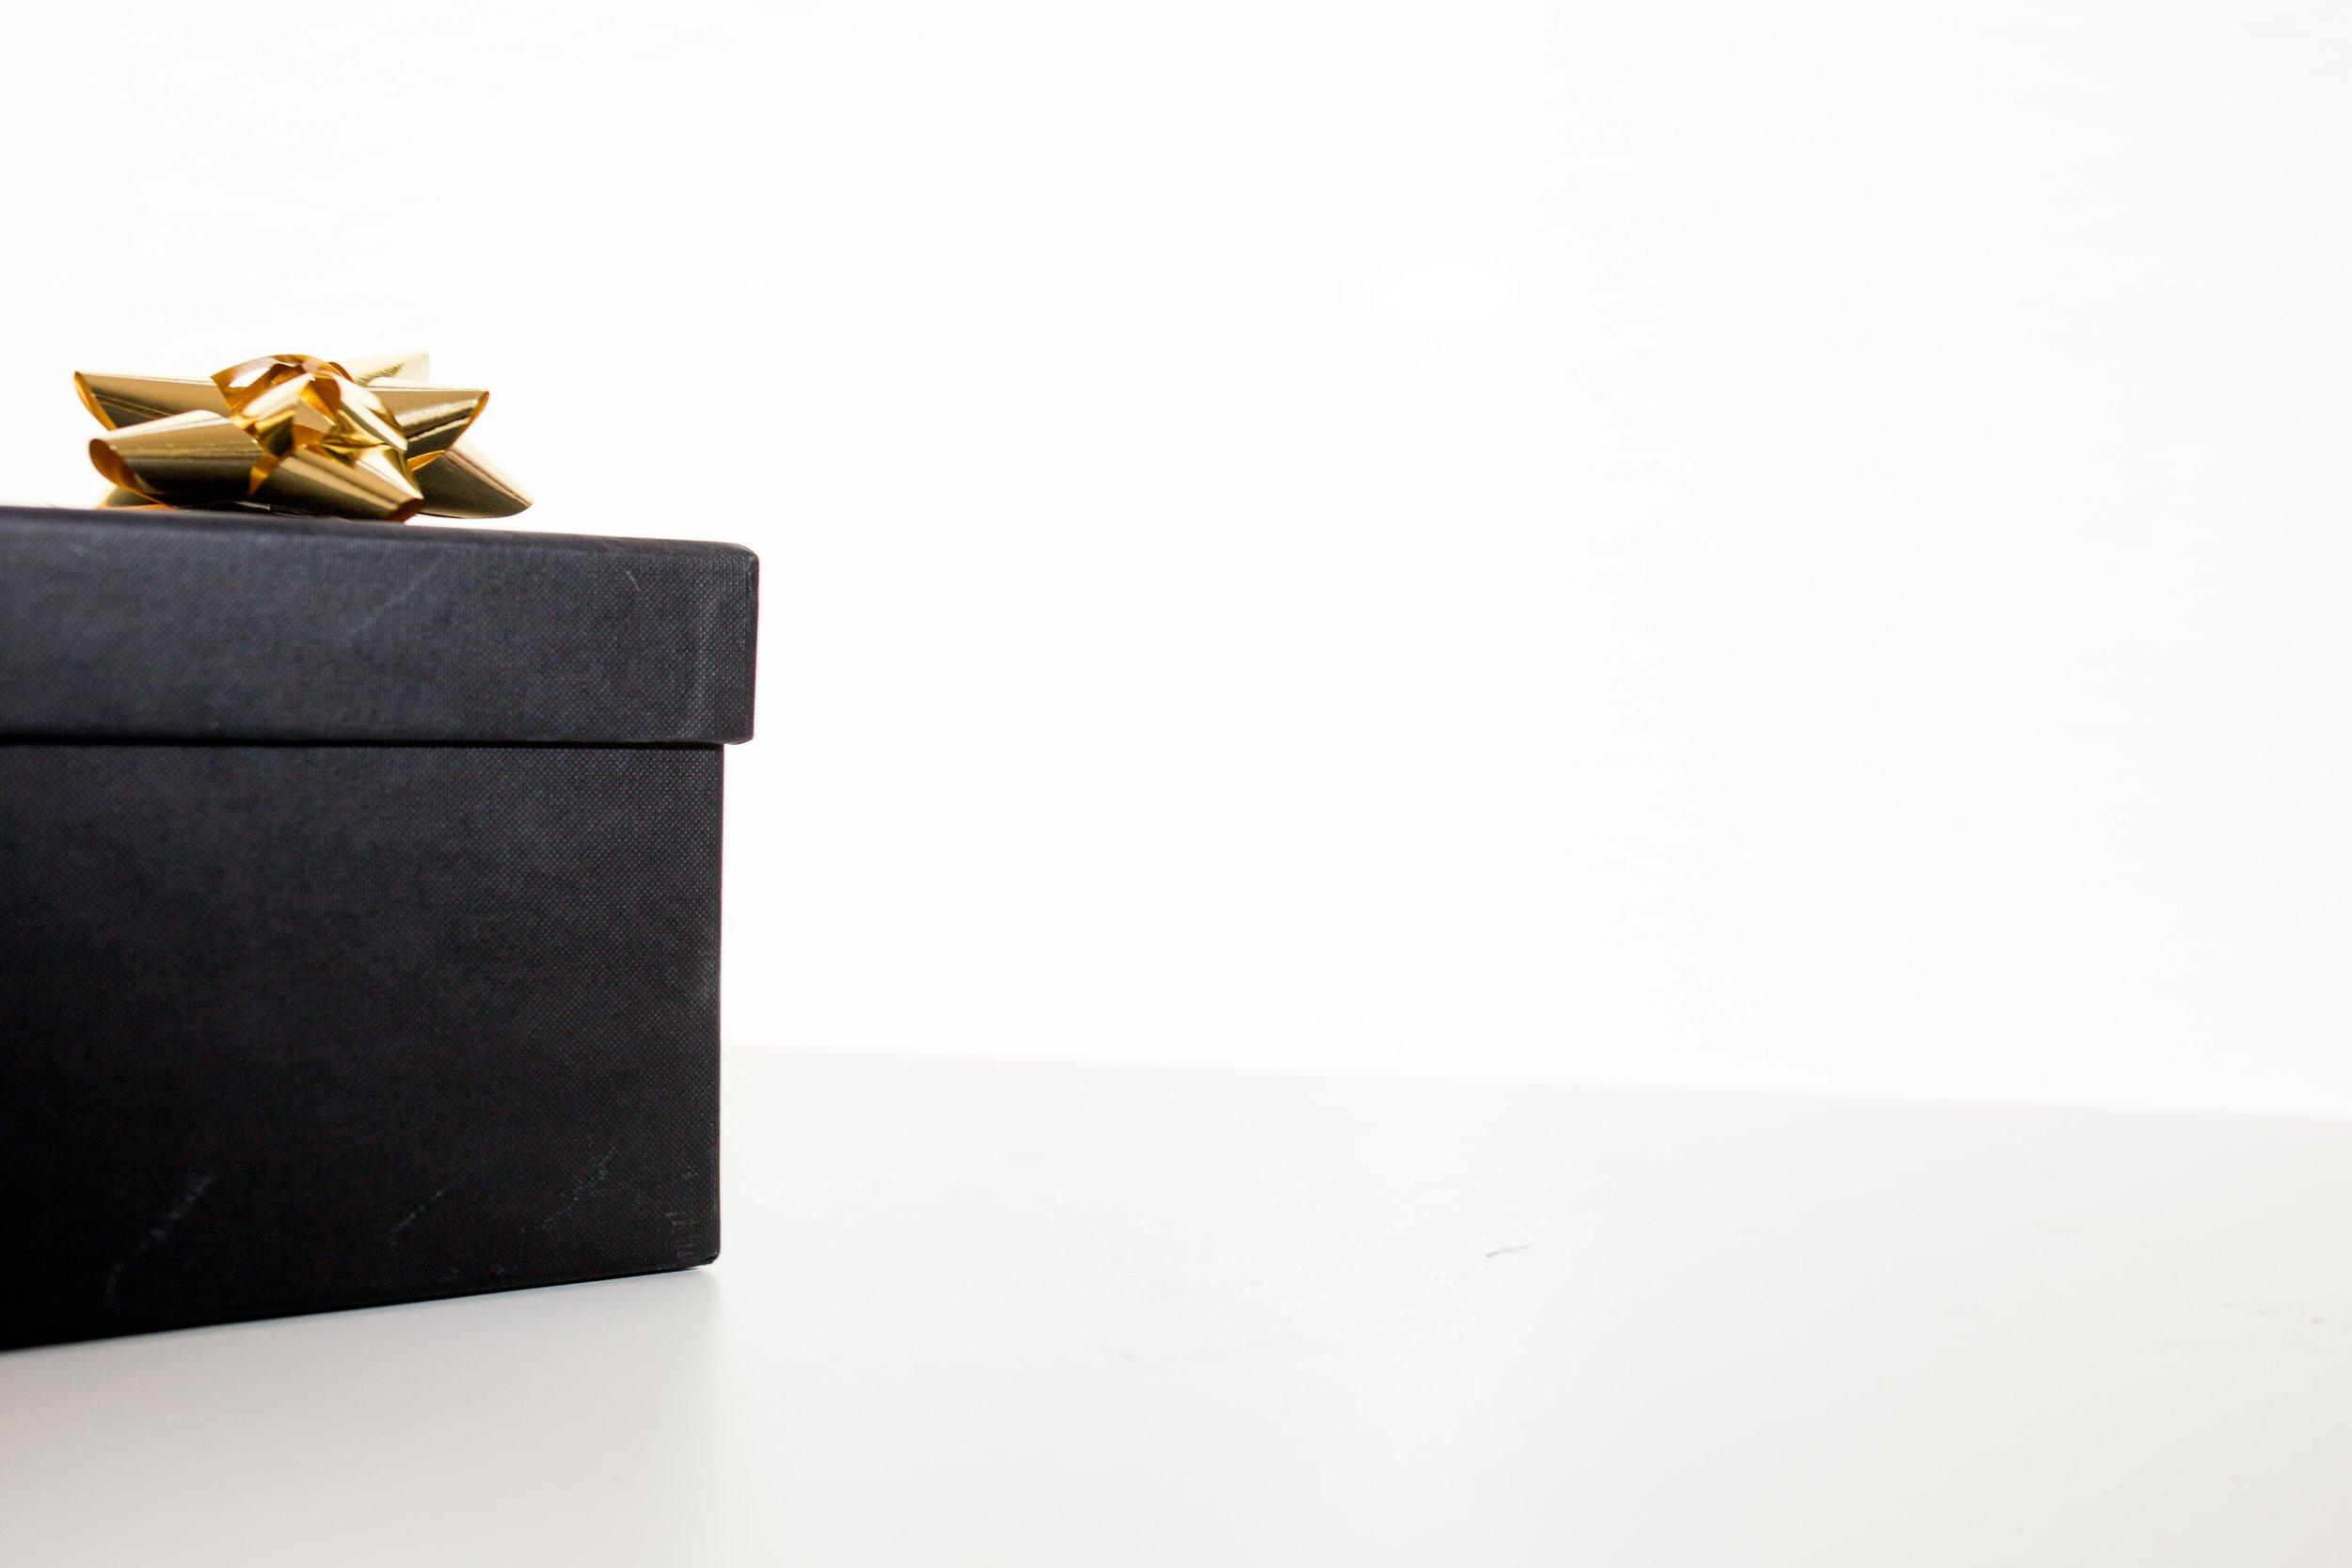 birthday-gift-bow-christmas-gift-190930.jpg